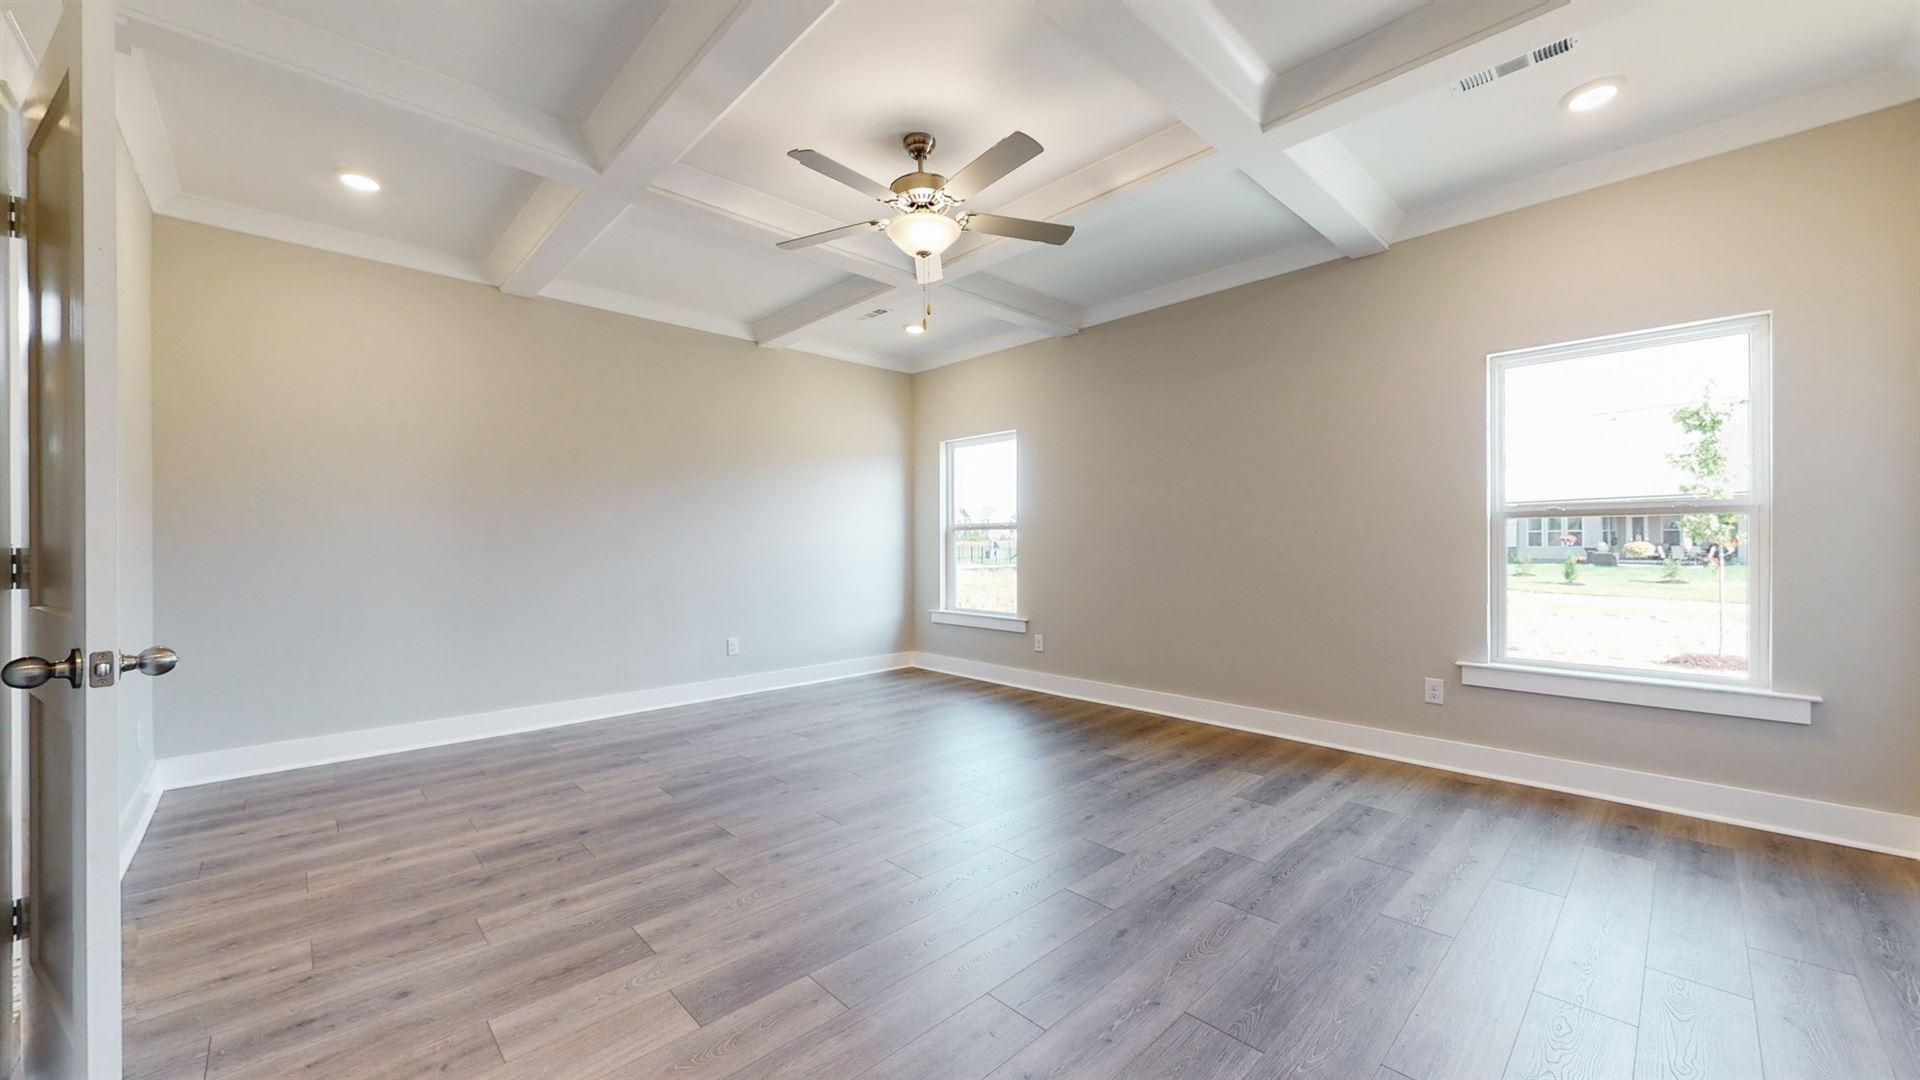 Photo of 1401 Proprietors Place, Murfreesboro, TN 37128 (MLS # 2292894)